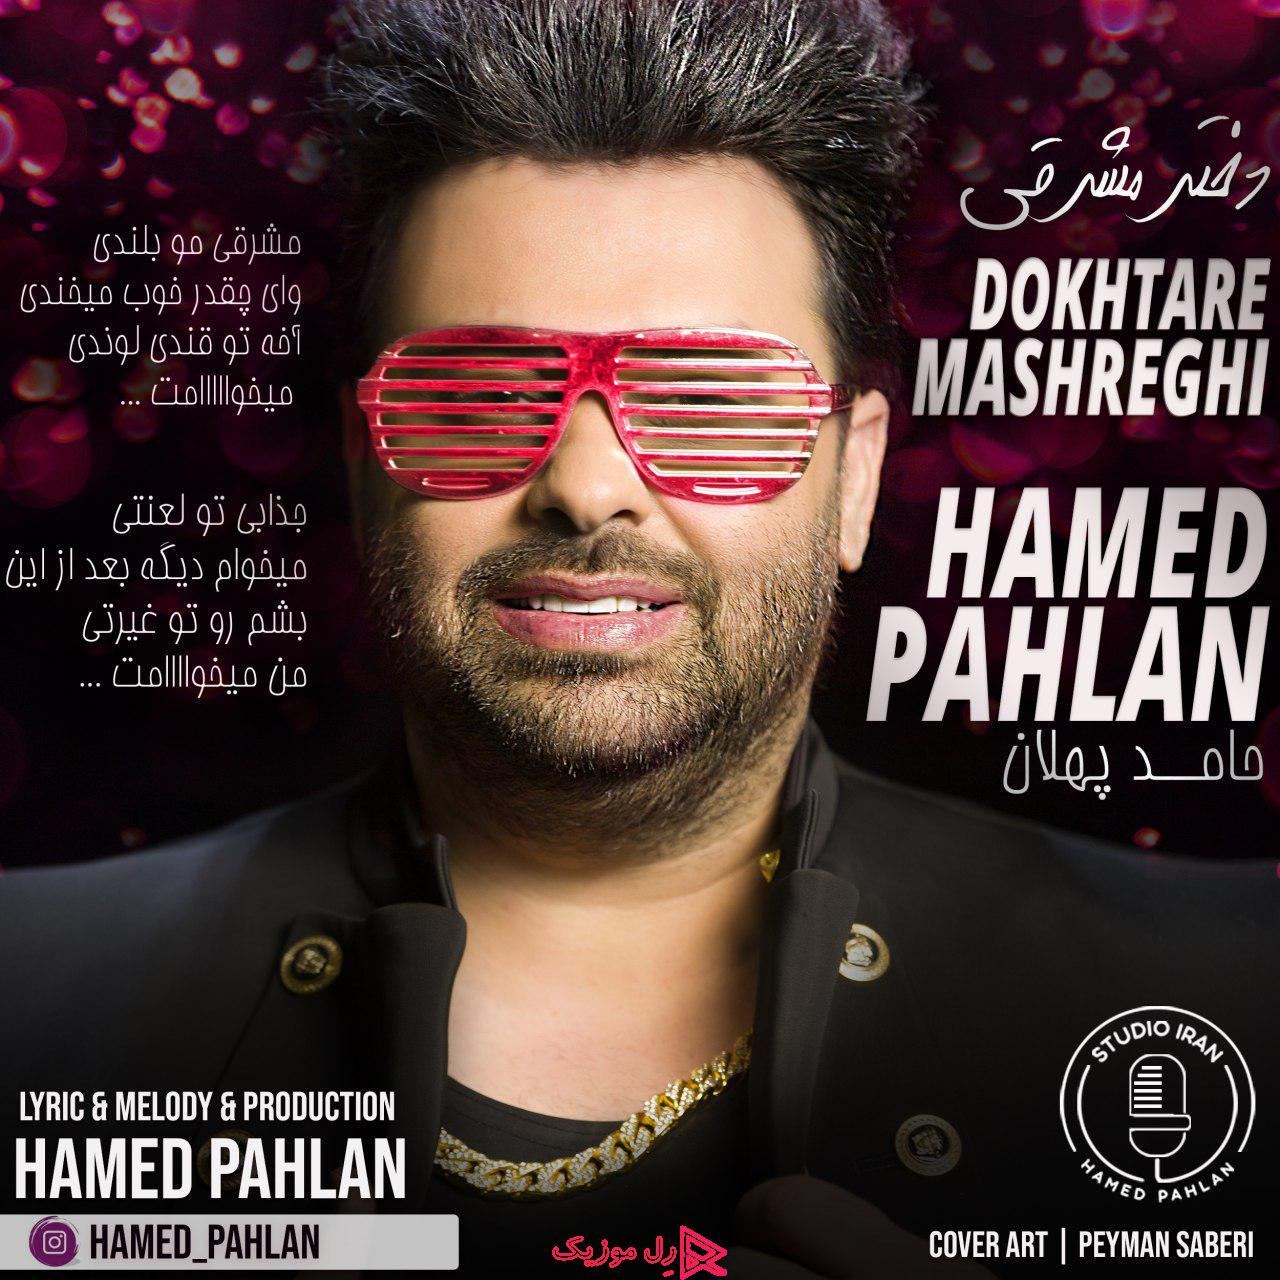 Hamed Pahlan Dokhtare Mashreghi RellMusic - دانلود آهنگ حامد پهلان به نام دختر مشرقی